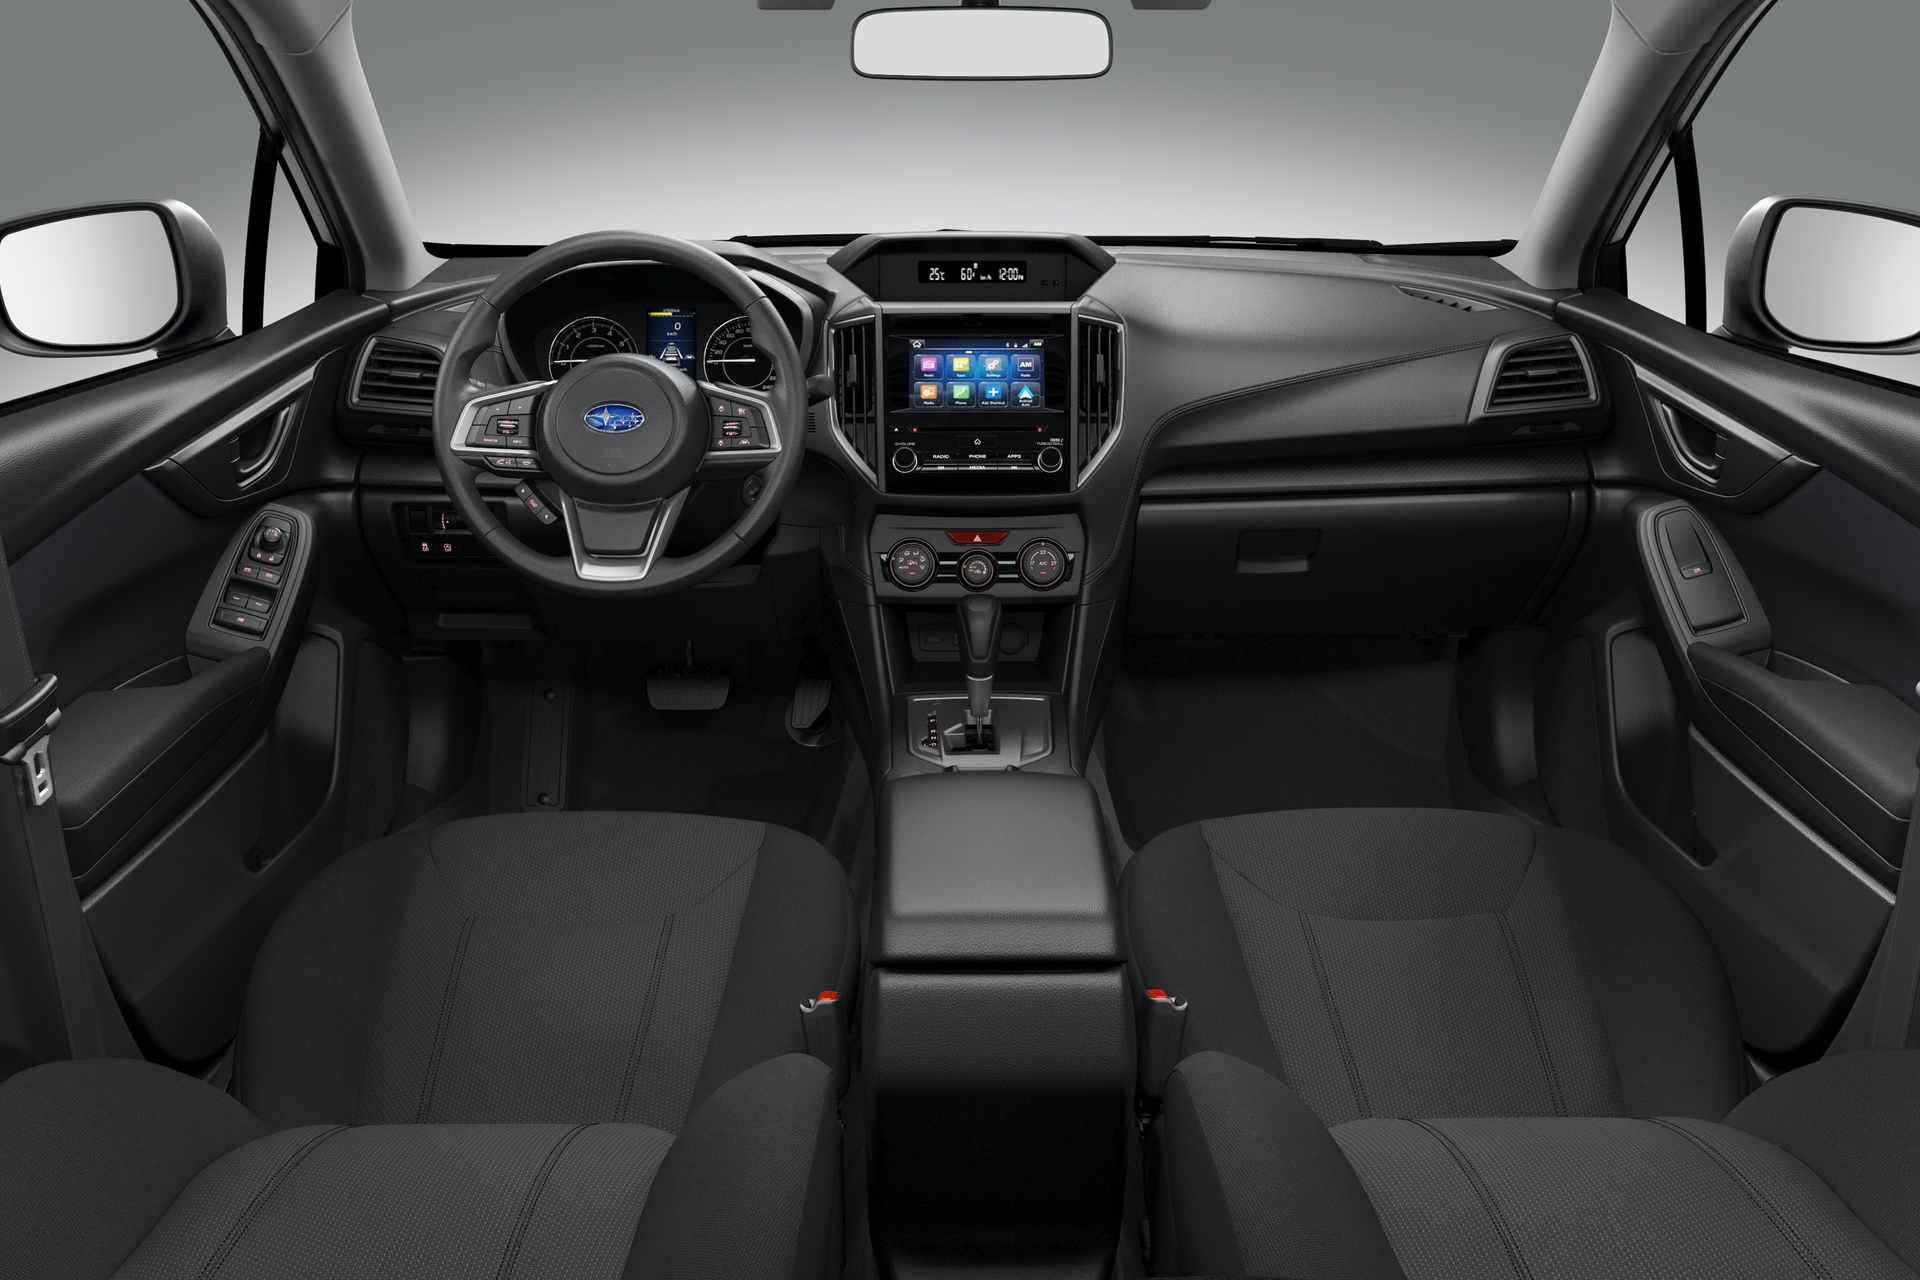 First_Drive_Subaru_Impreza_0013